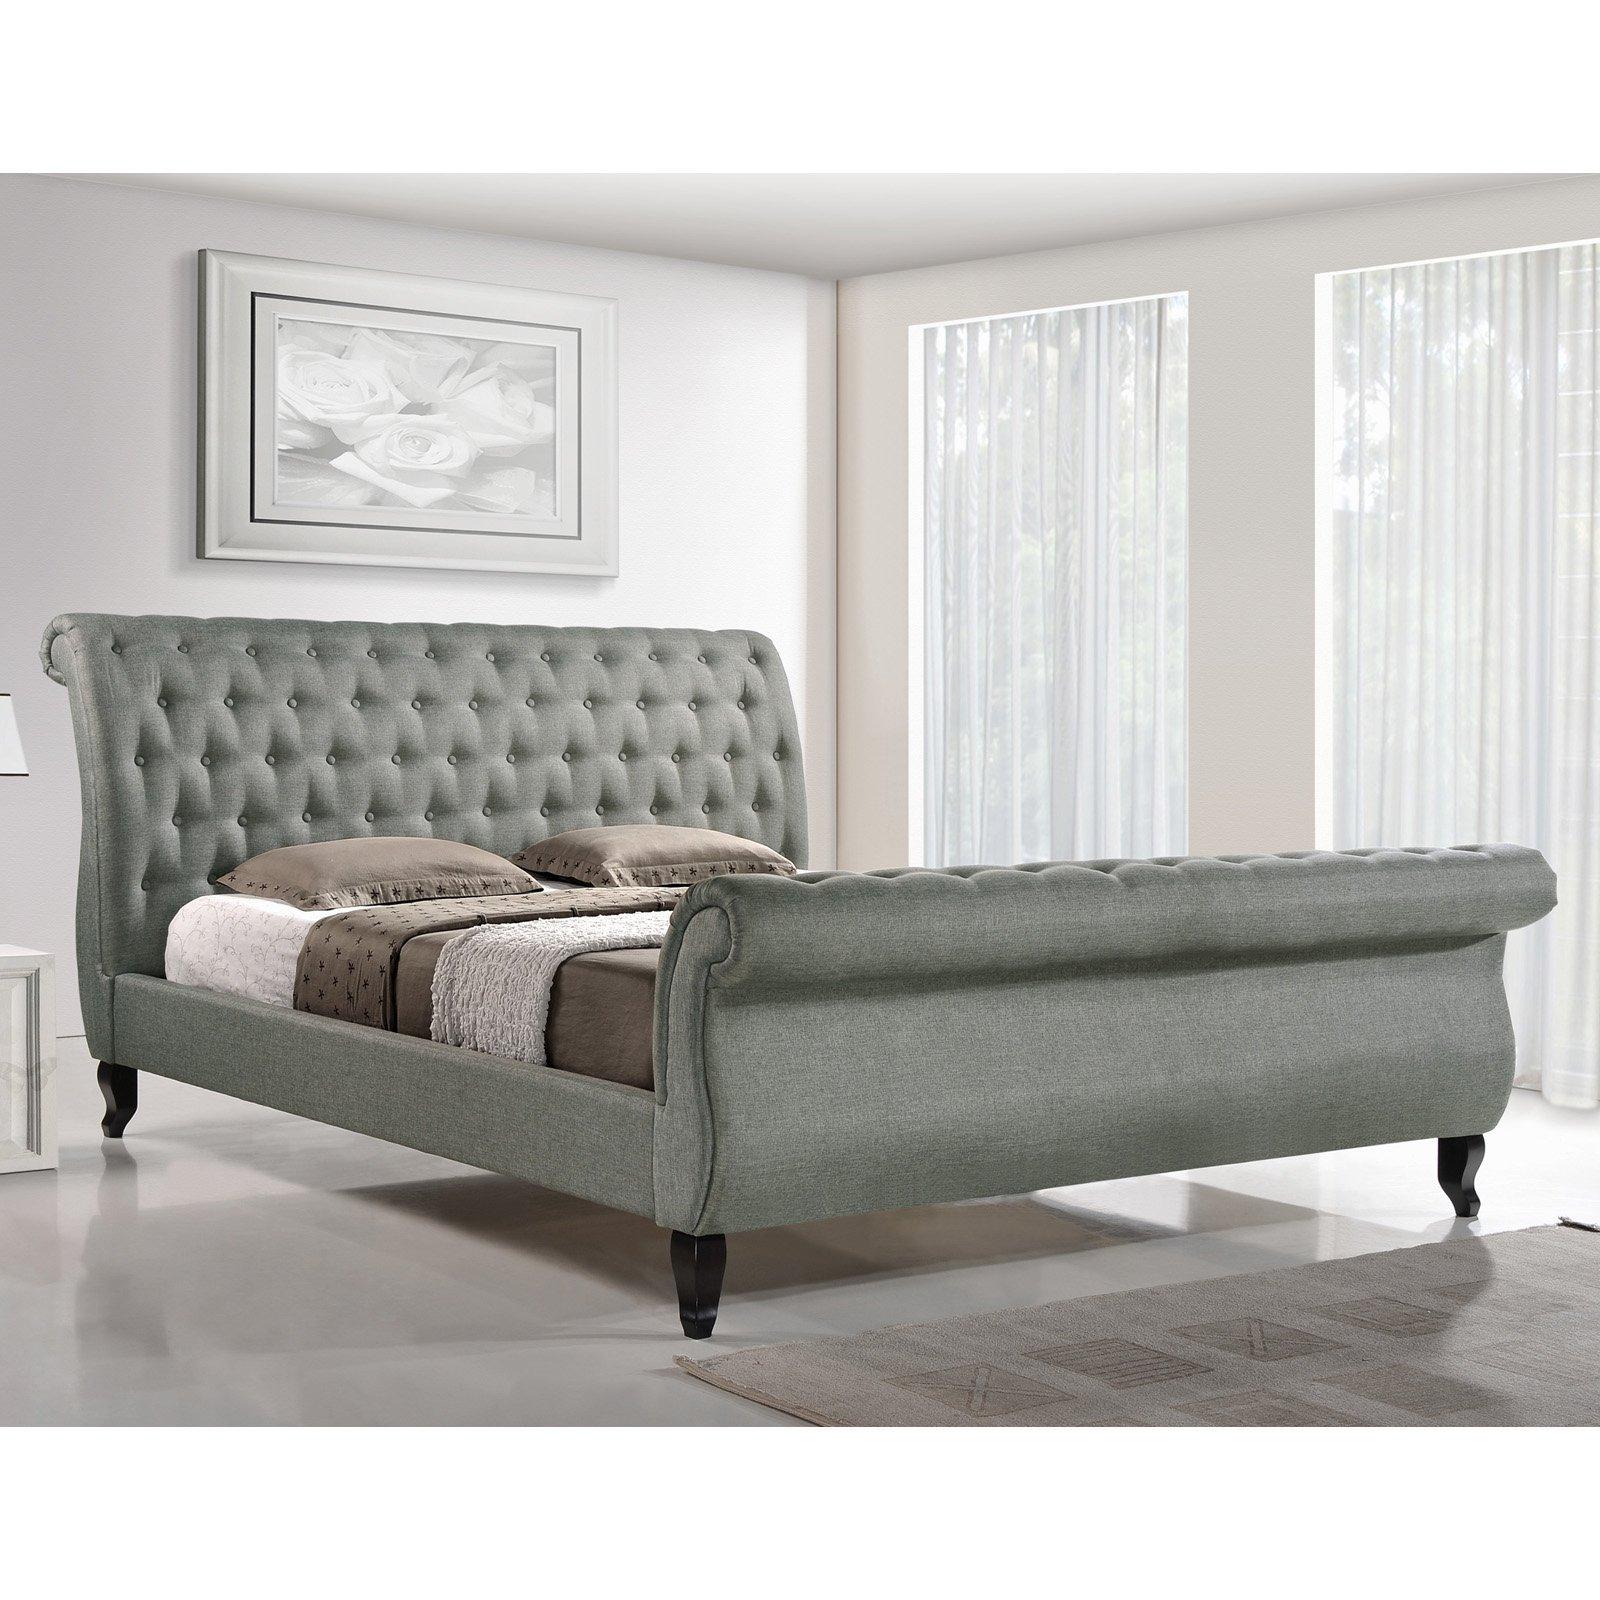 Baxton Studio King Fabric Bed Grey Box 1 Of 3 Walmart Com